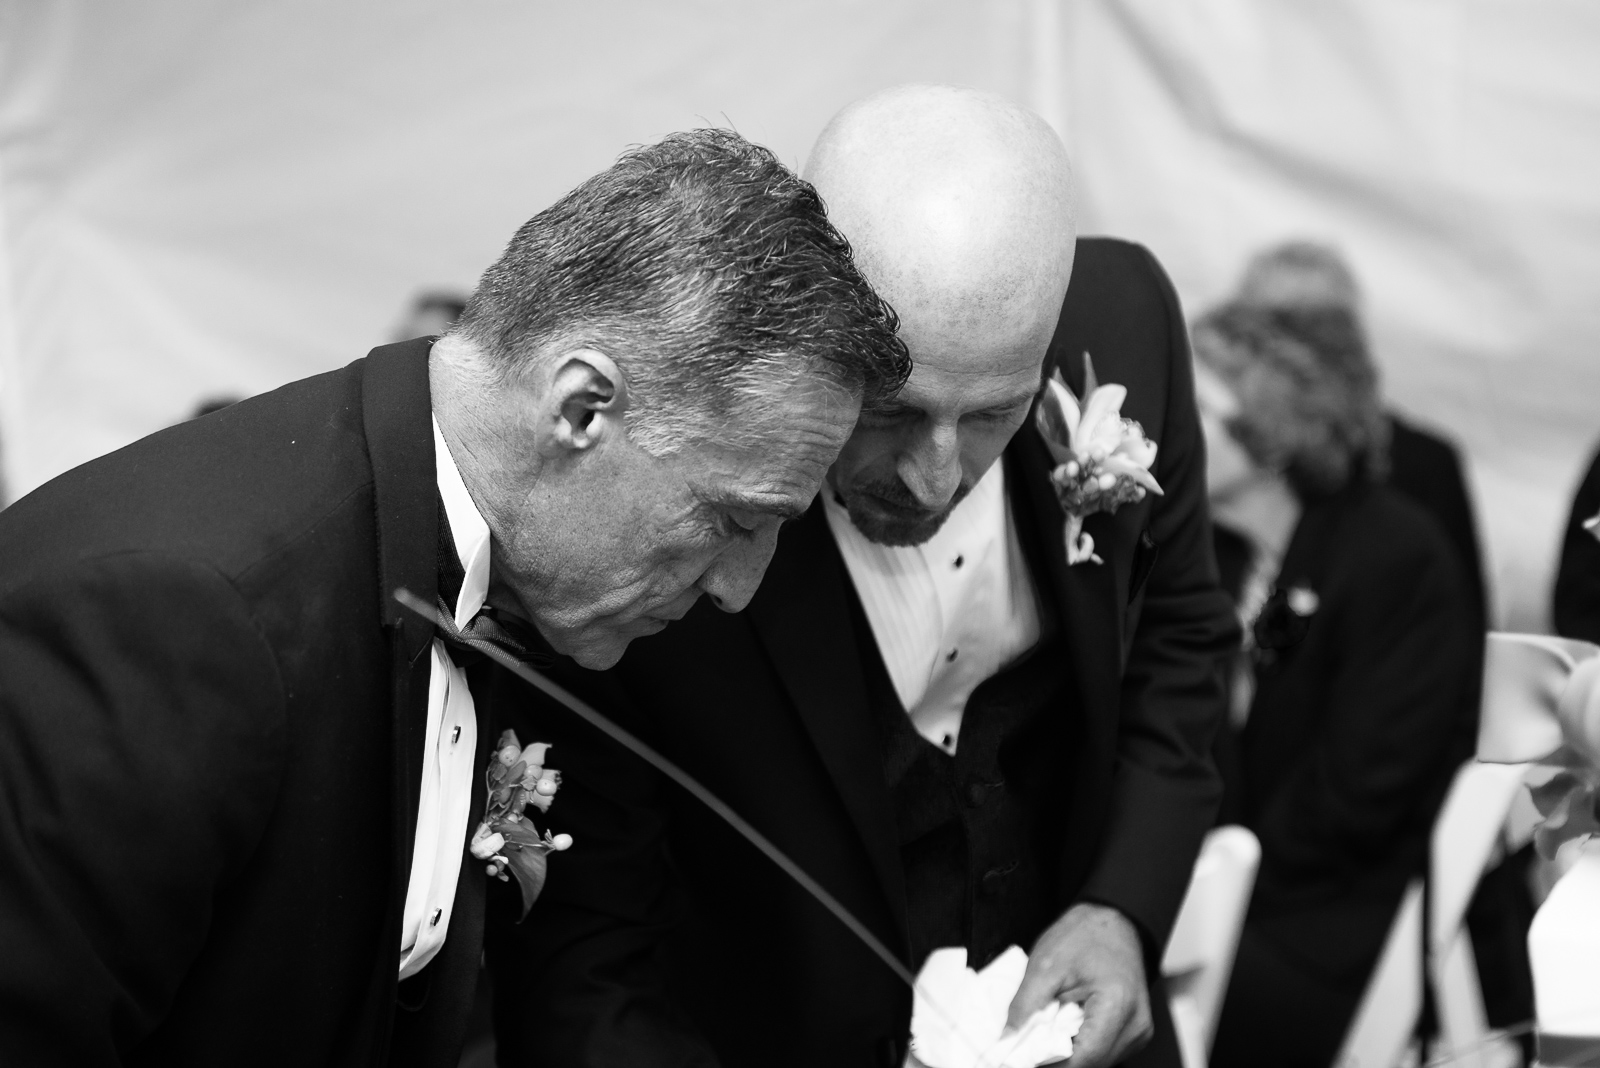 Michael-Napier-Weddings-Ludwig-Guilbeau Wedding-20 (41).jpg